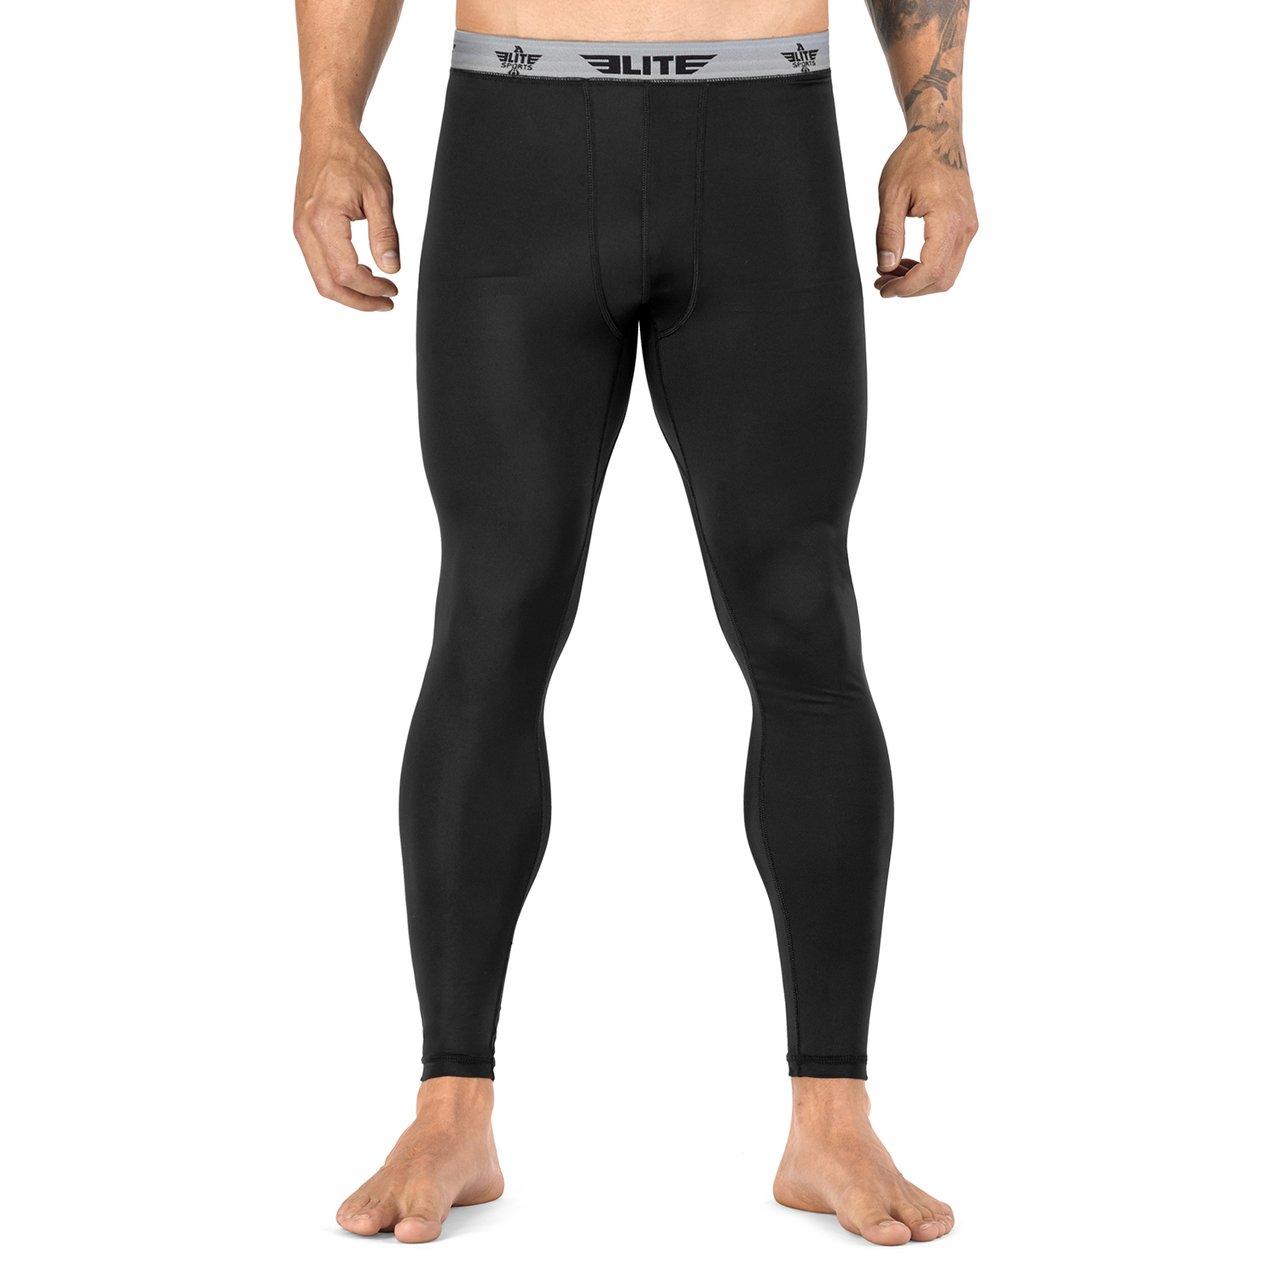 Elite Sports Workout Standard MMA BJJ Spats Base Layer Compression Pants Tights